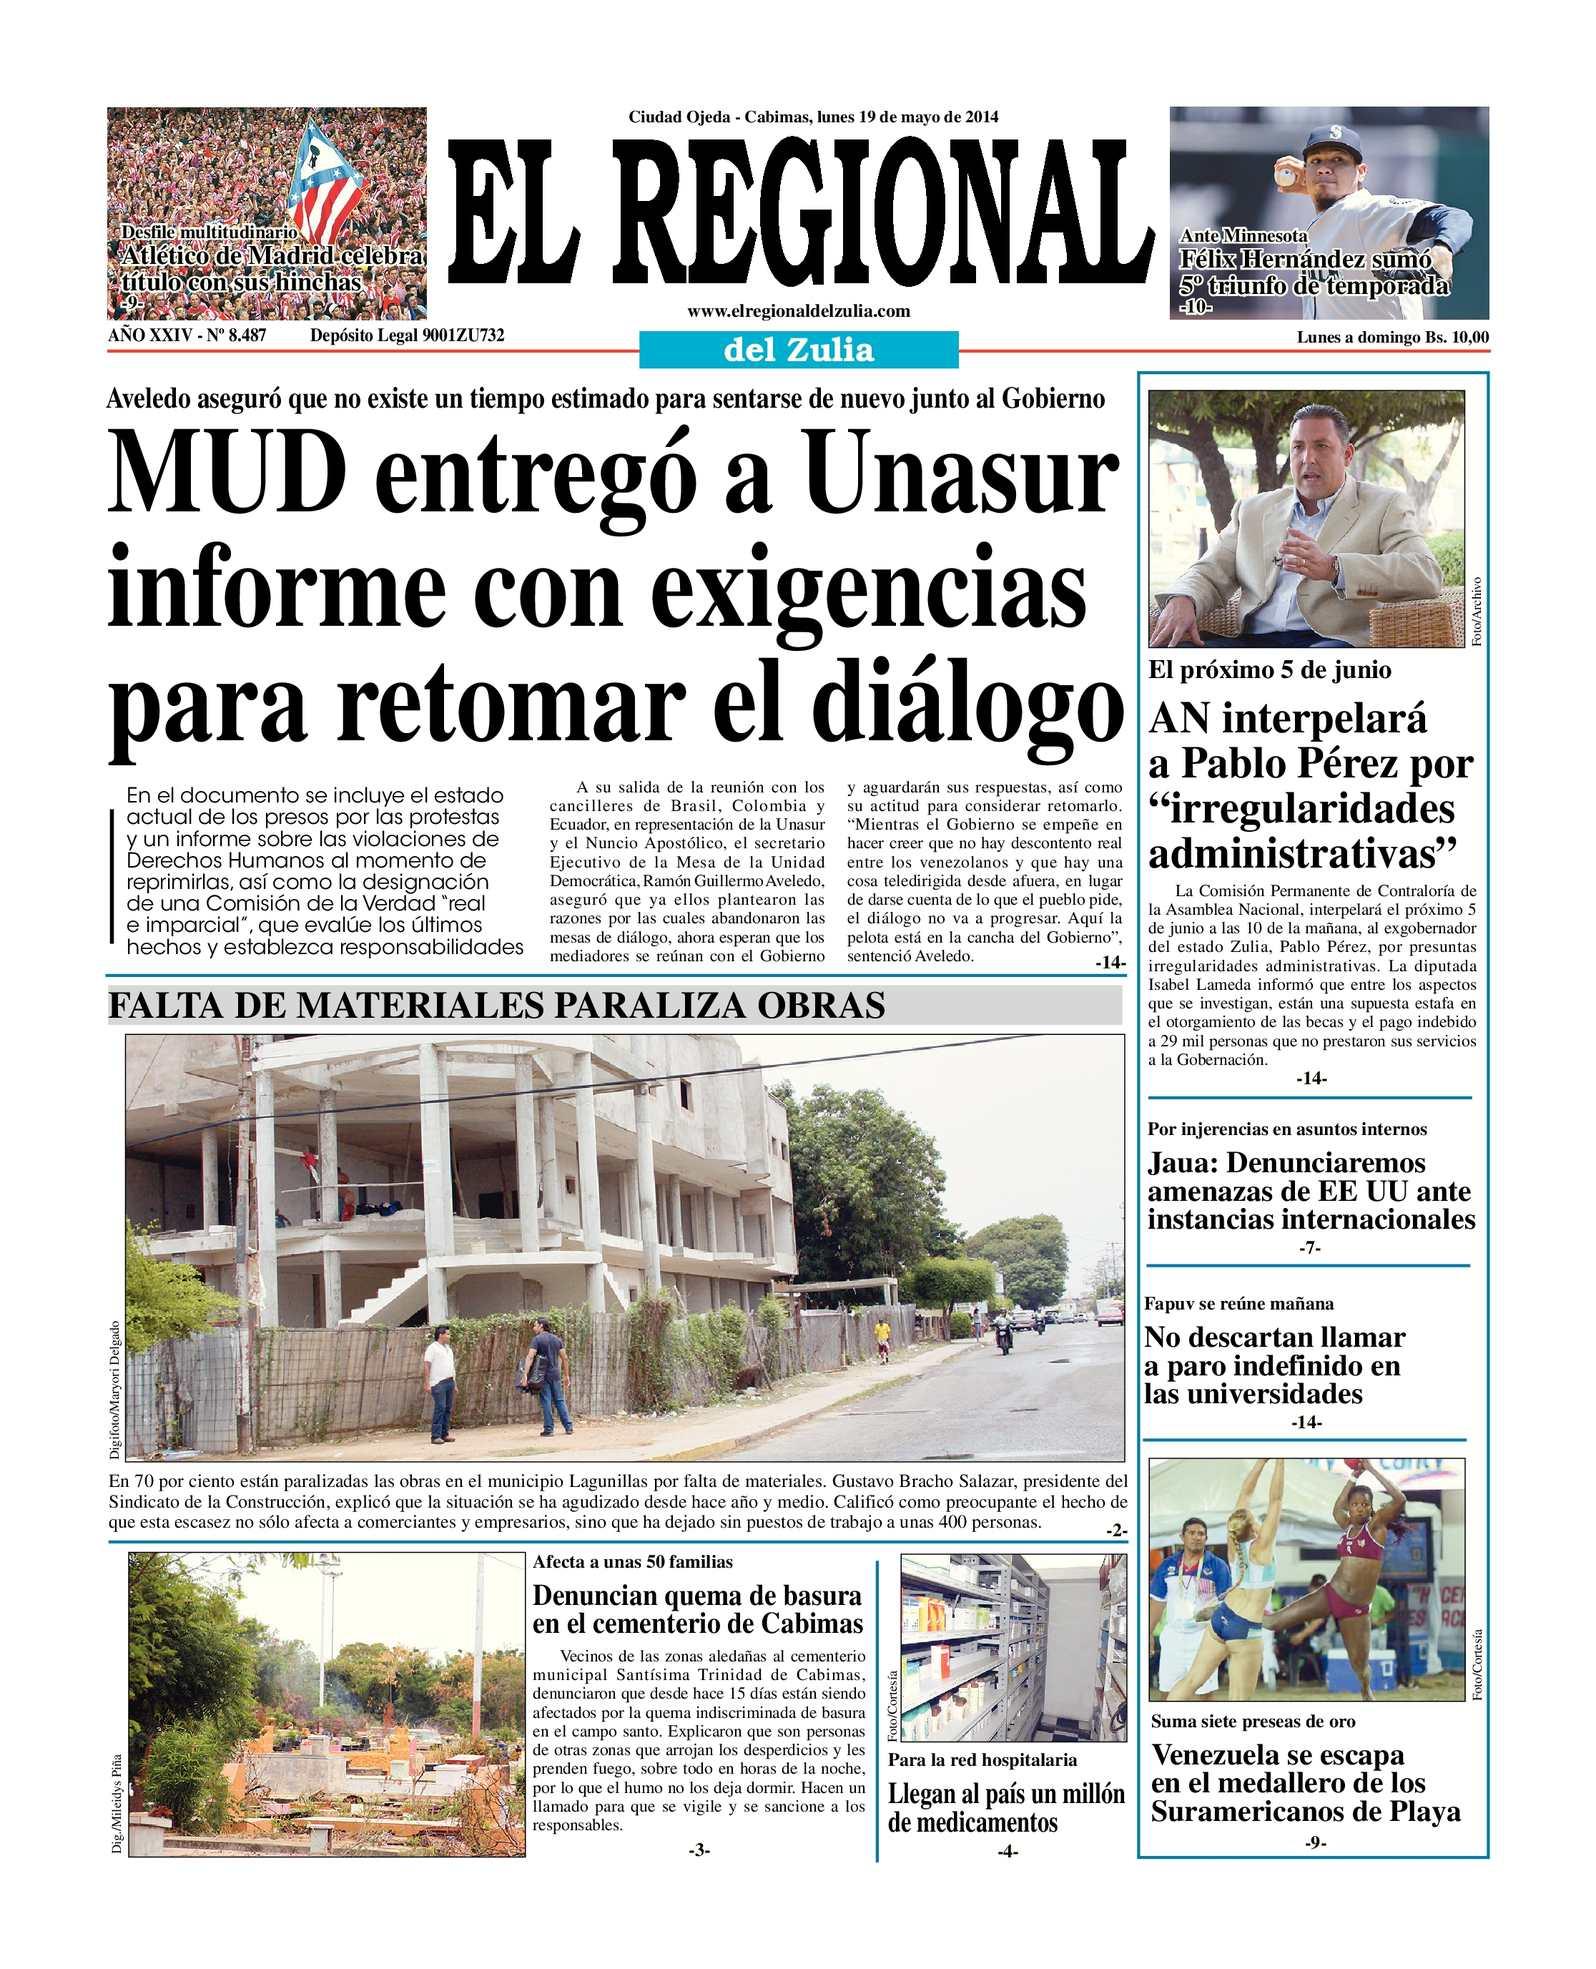 Calaméo - El Regional del Zulia 19-05-2014